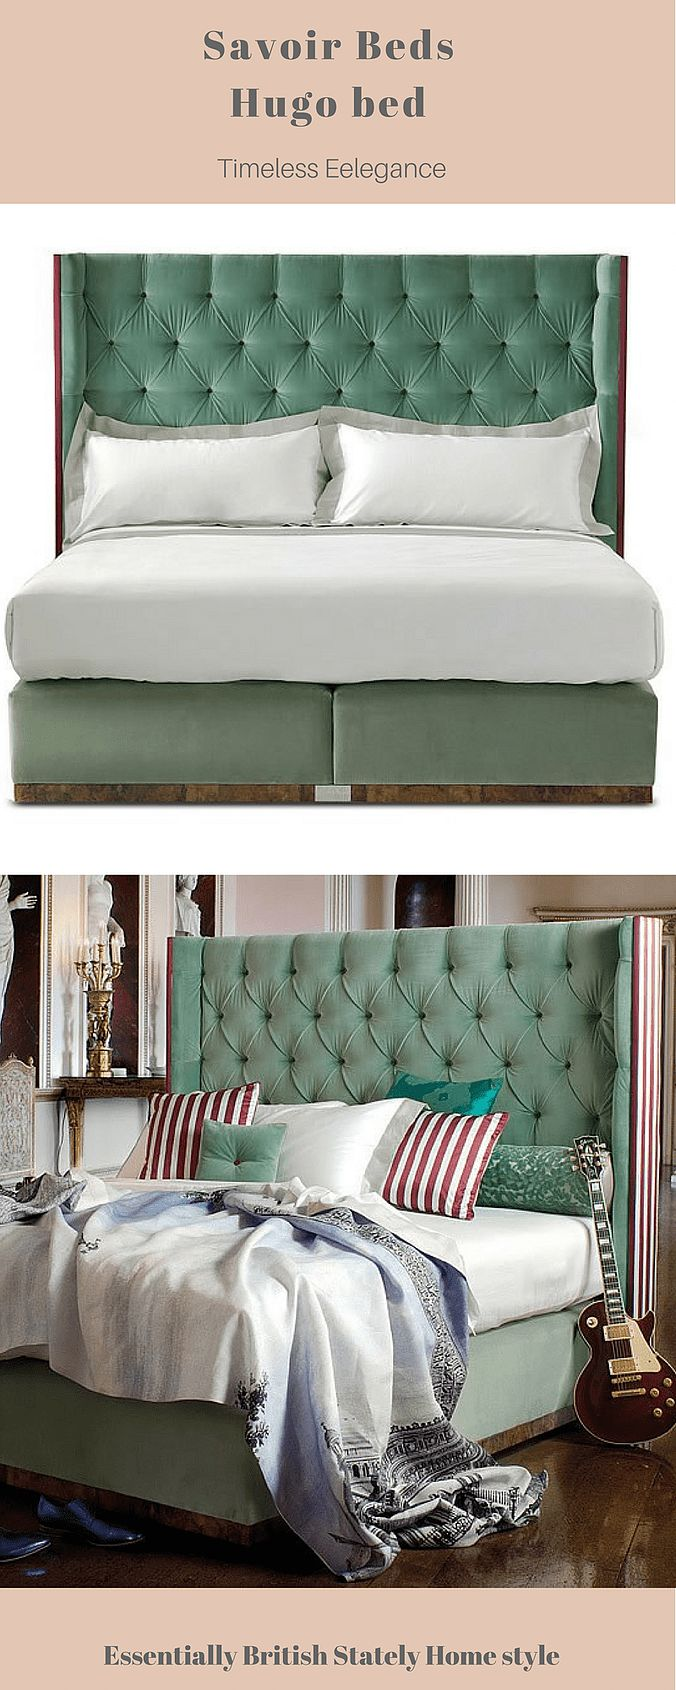 Where To Buy Bedroom Decor